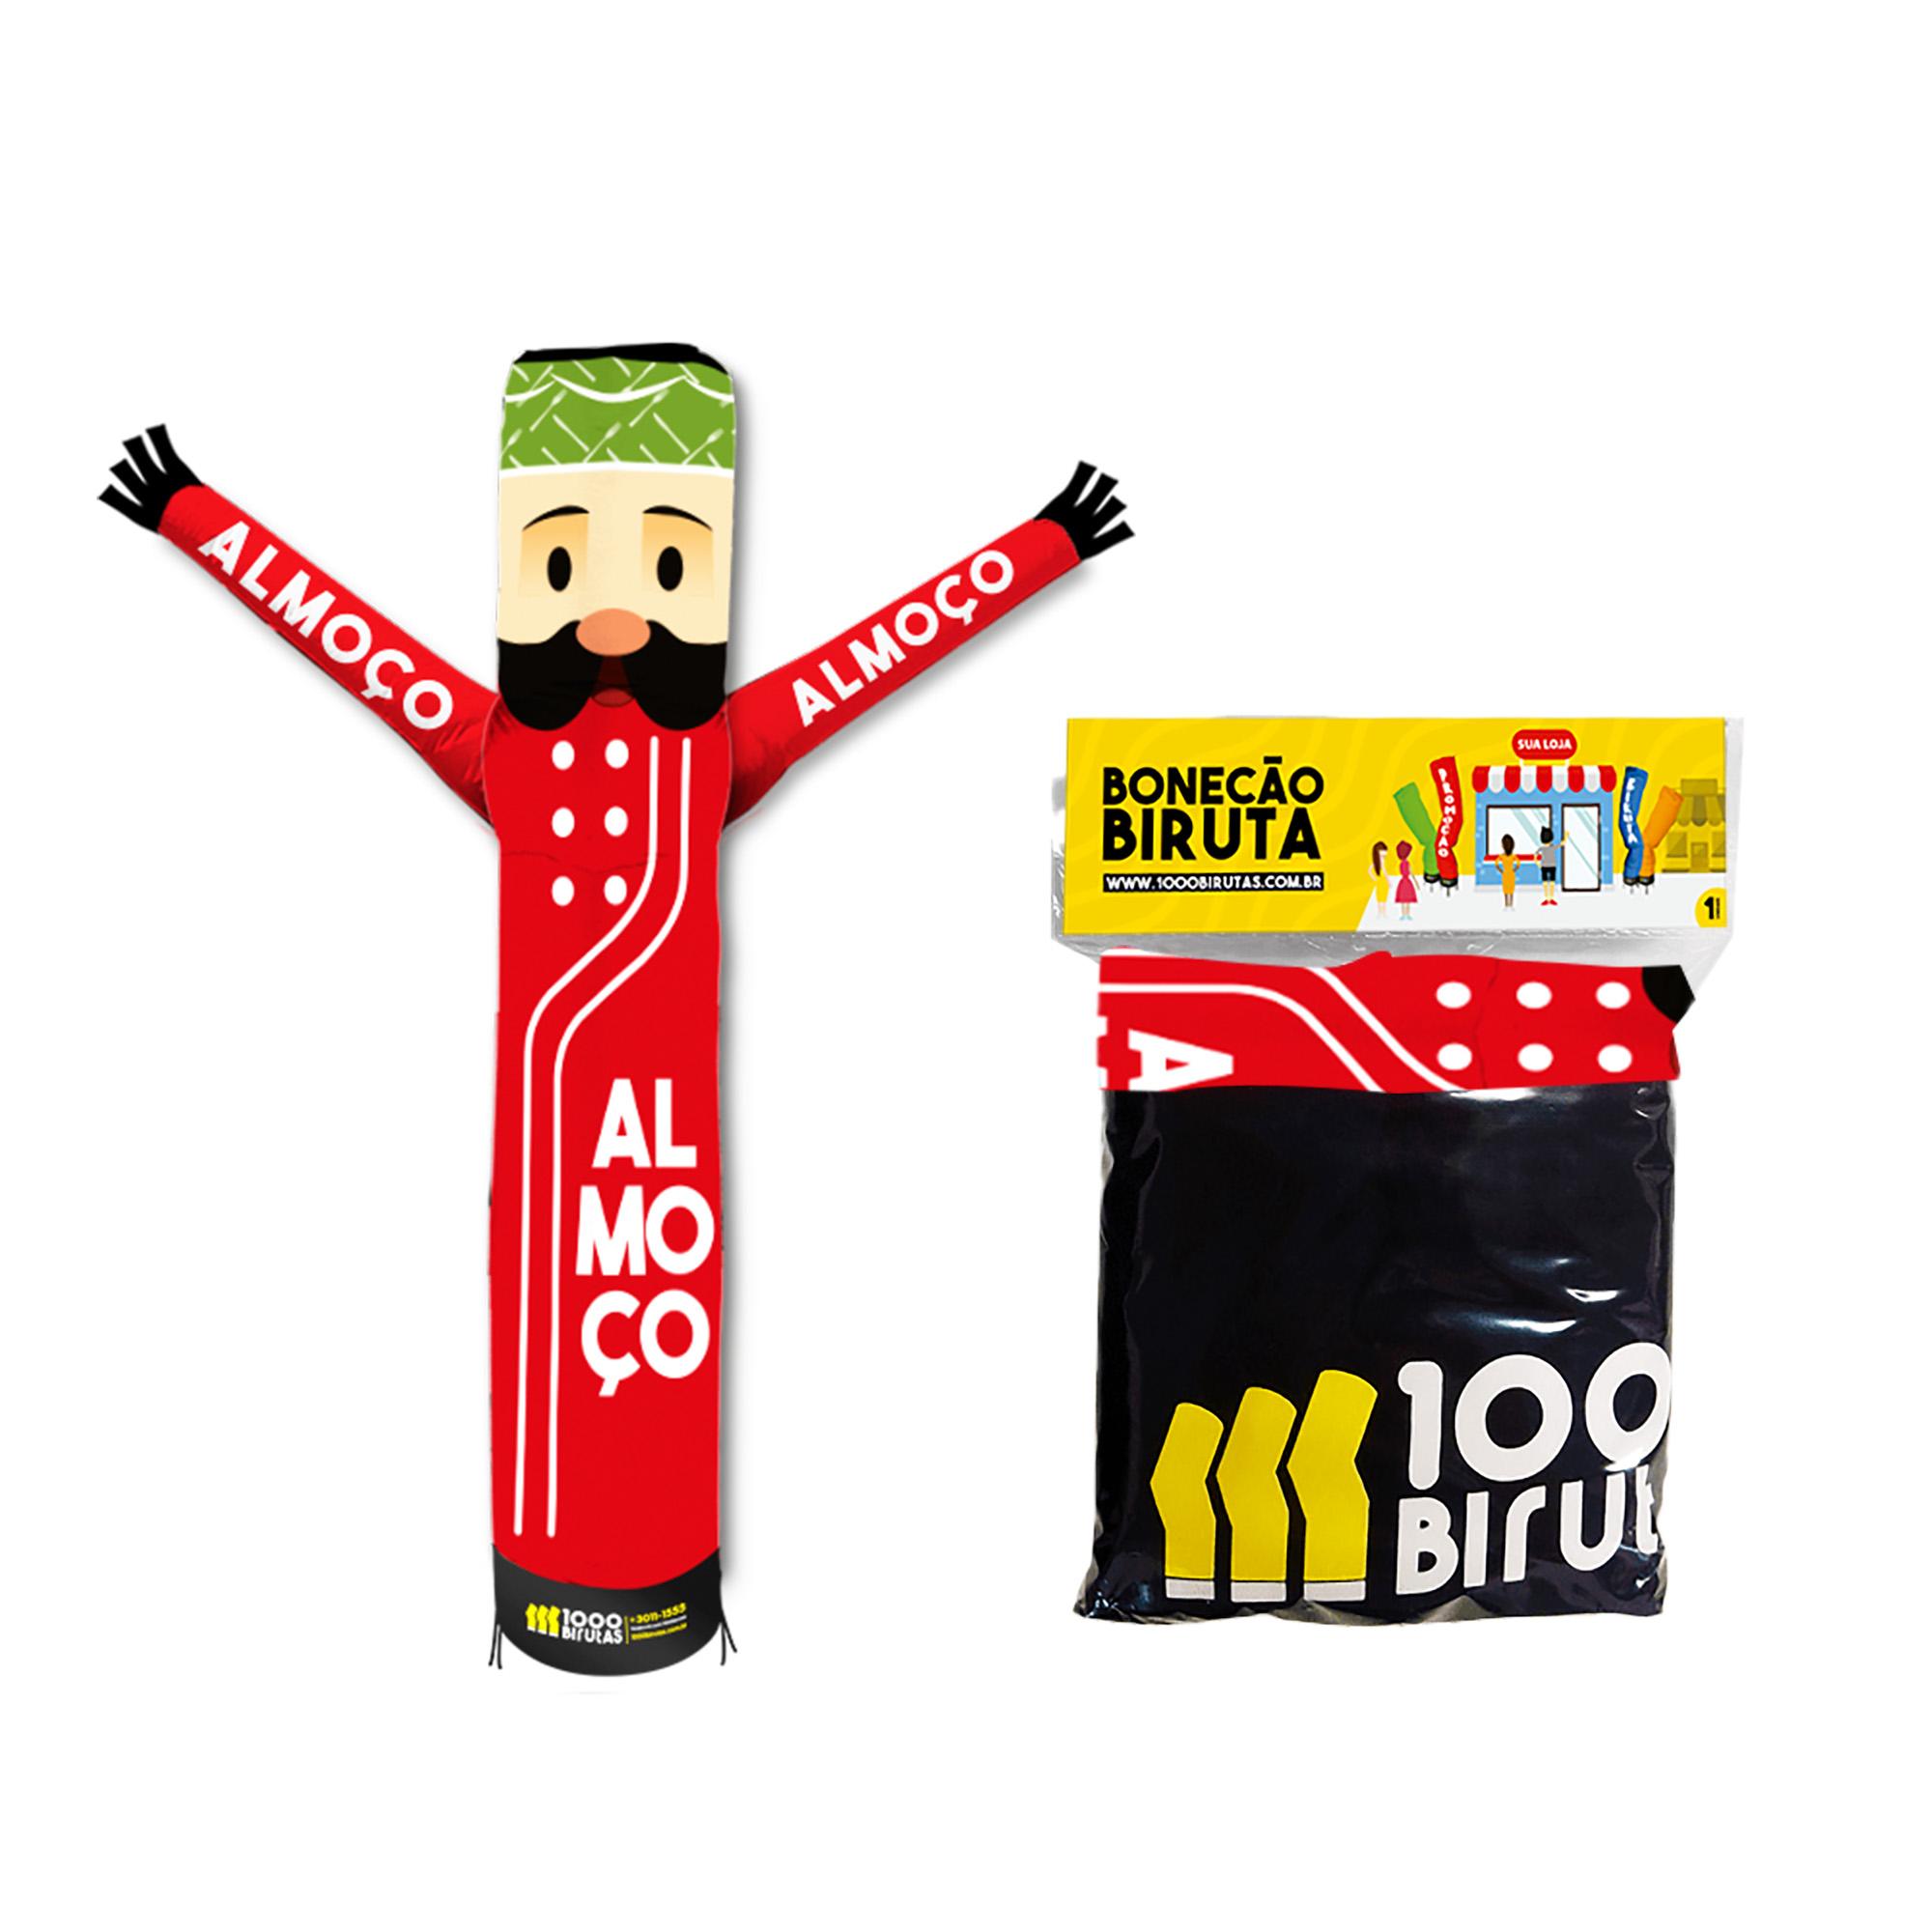 Boneco Bonekito Pano 2M Hora do Almoço  - 1000 Birutas